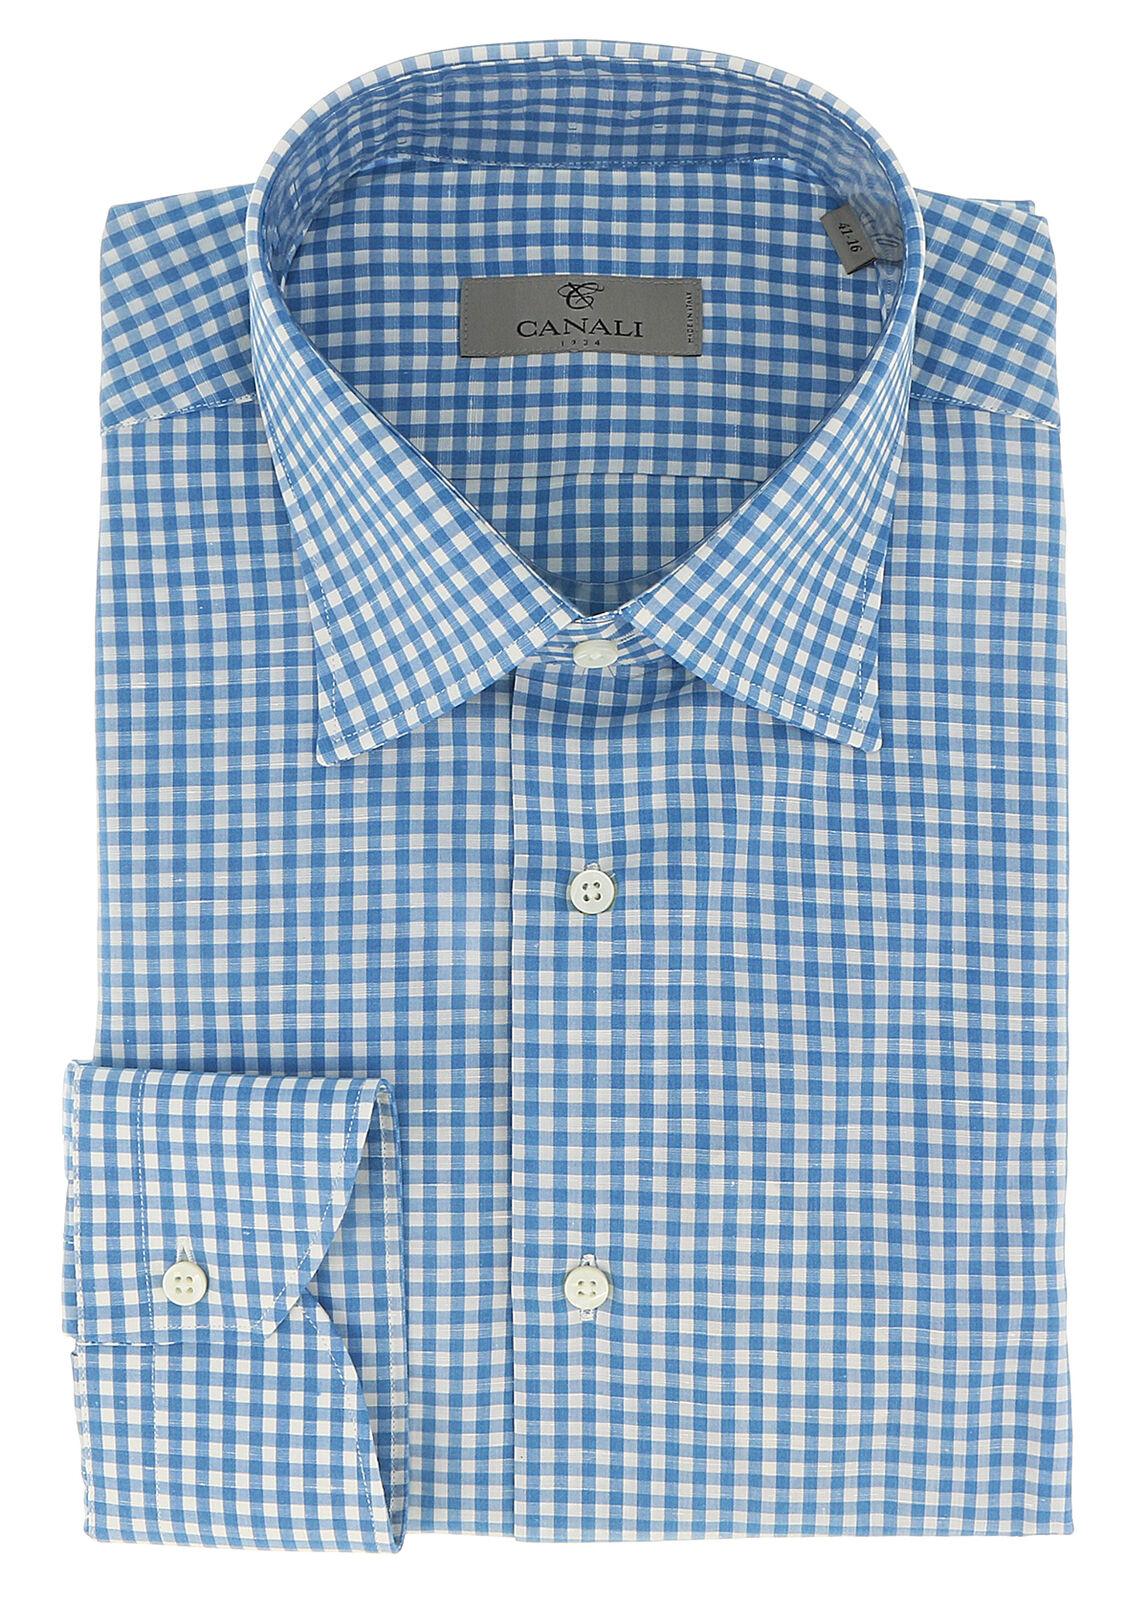 Canali Blau Gingham Formal Shirts